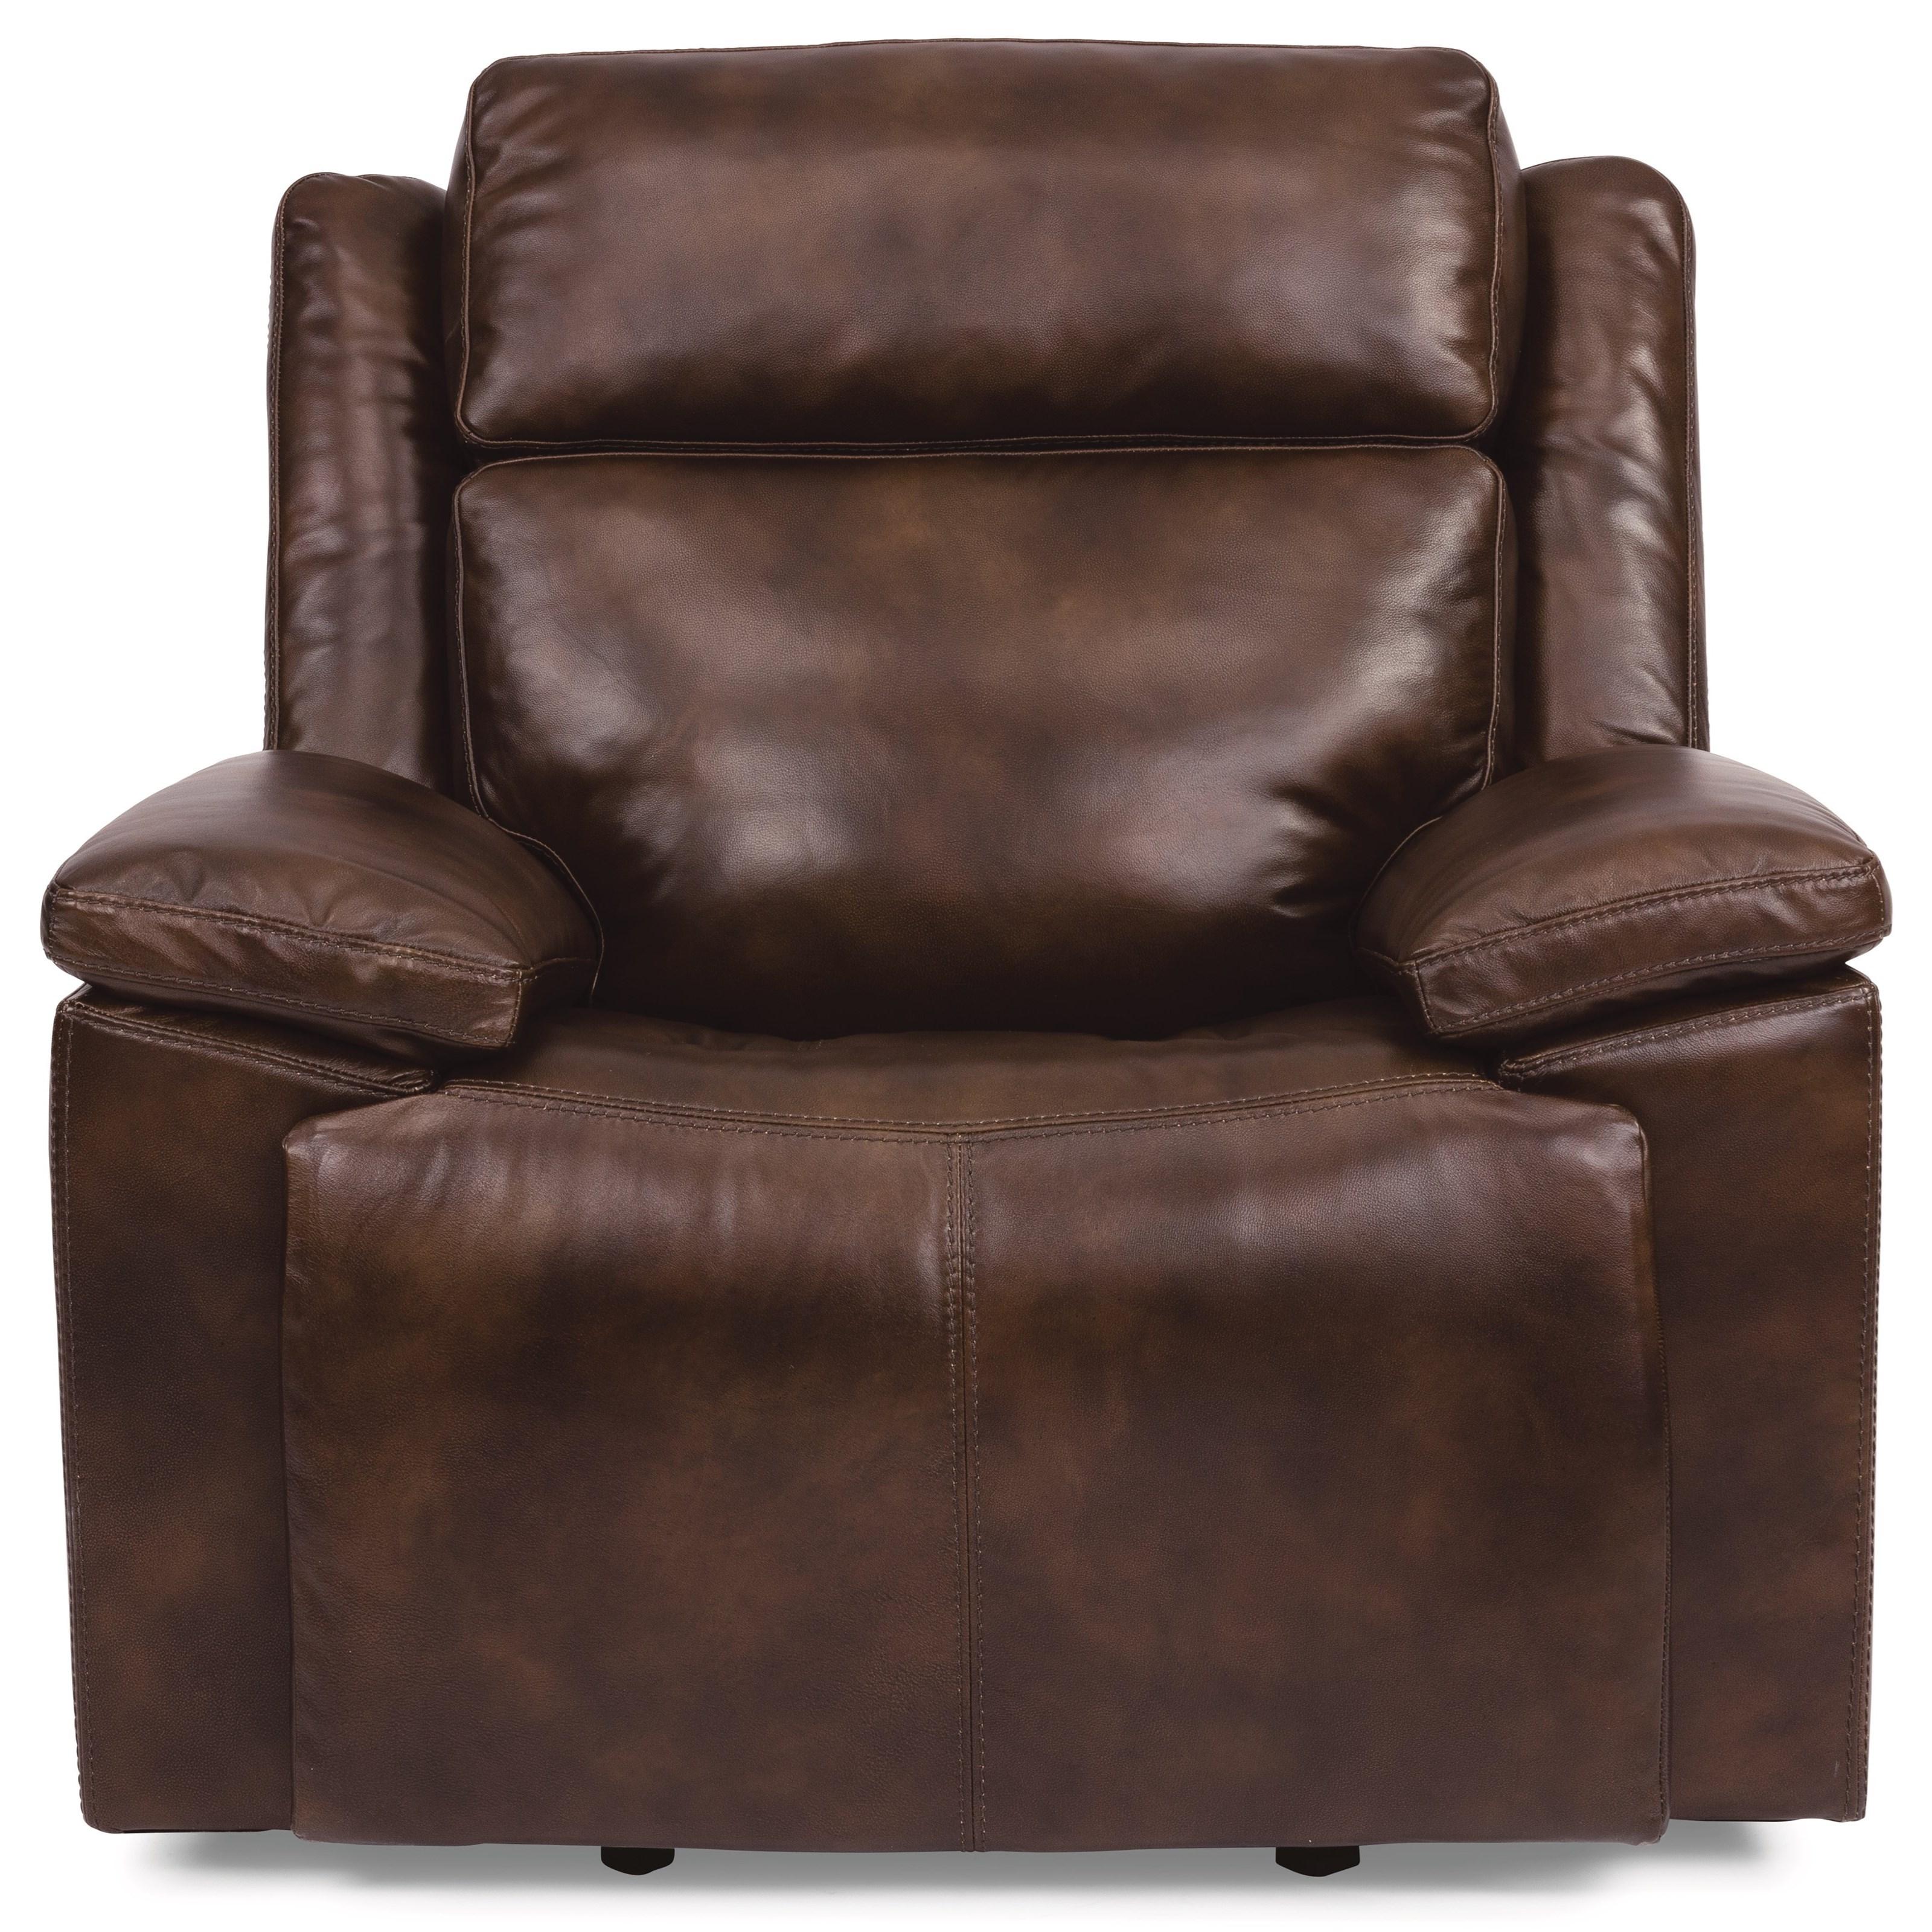 Latitudes - Chance Pwr Gliding Recl w/ Pwr Headrest by Flexsteel at Walker's Furniture